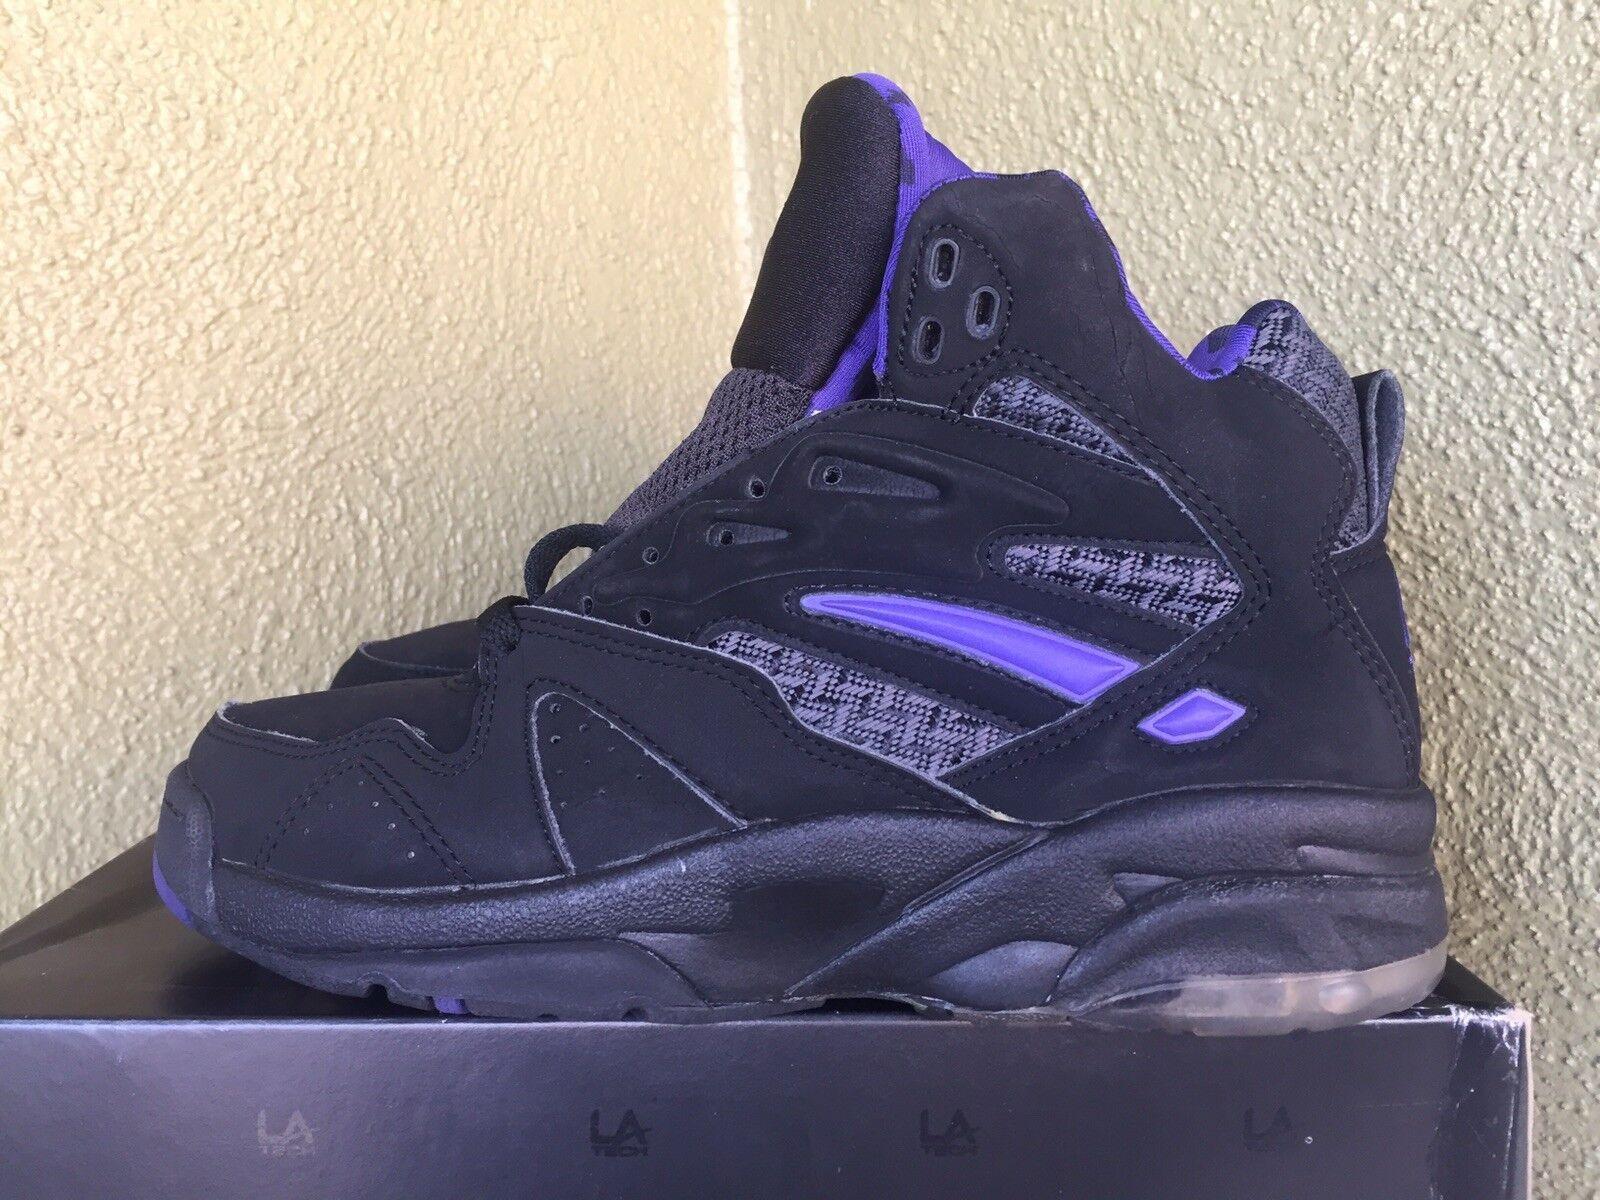 Vintage 1993 LA TECH Basketball scarpe BY LA LA LA GEAR Sz. 7.5 DS LIGHT UPS Make Offer ec632a